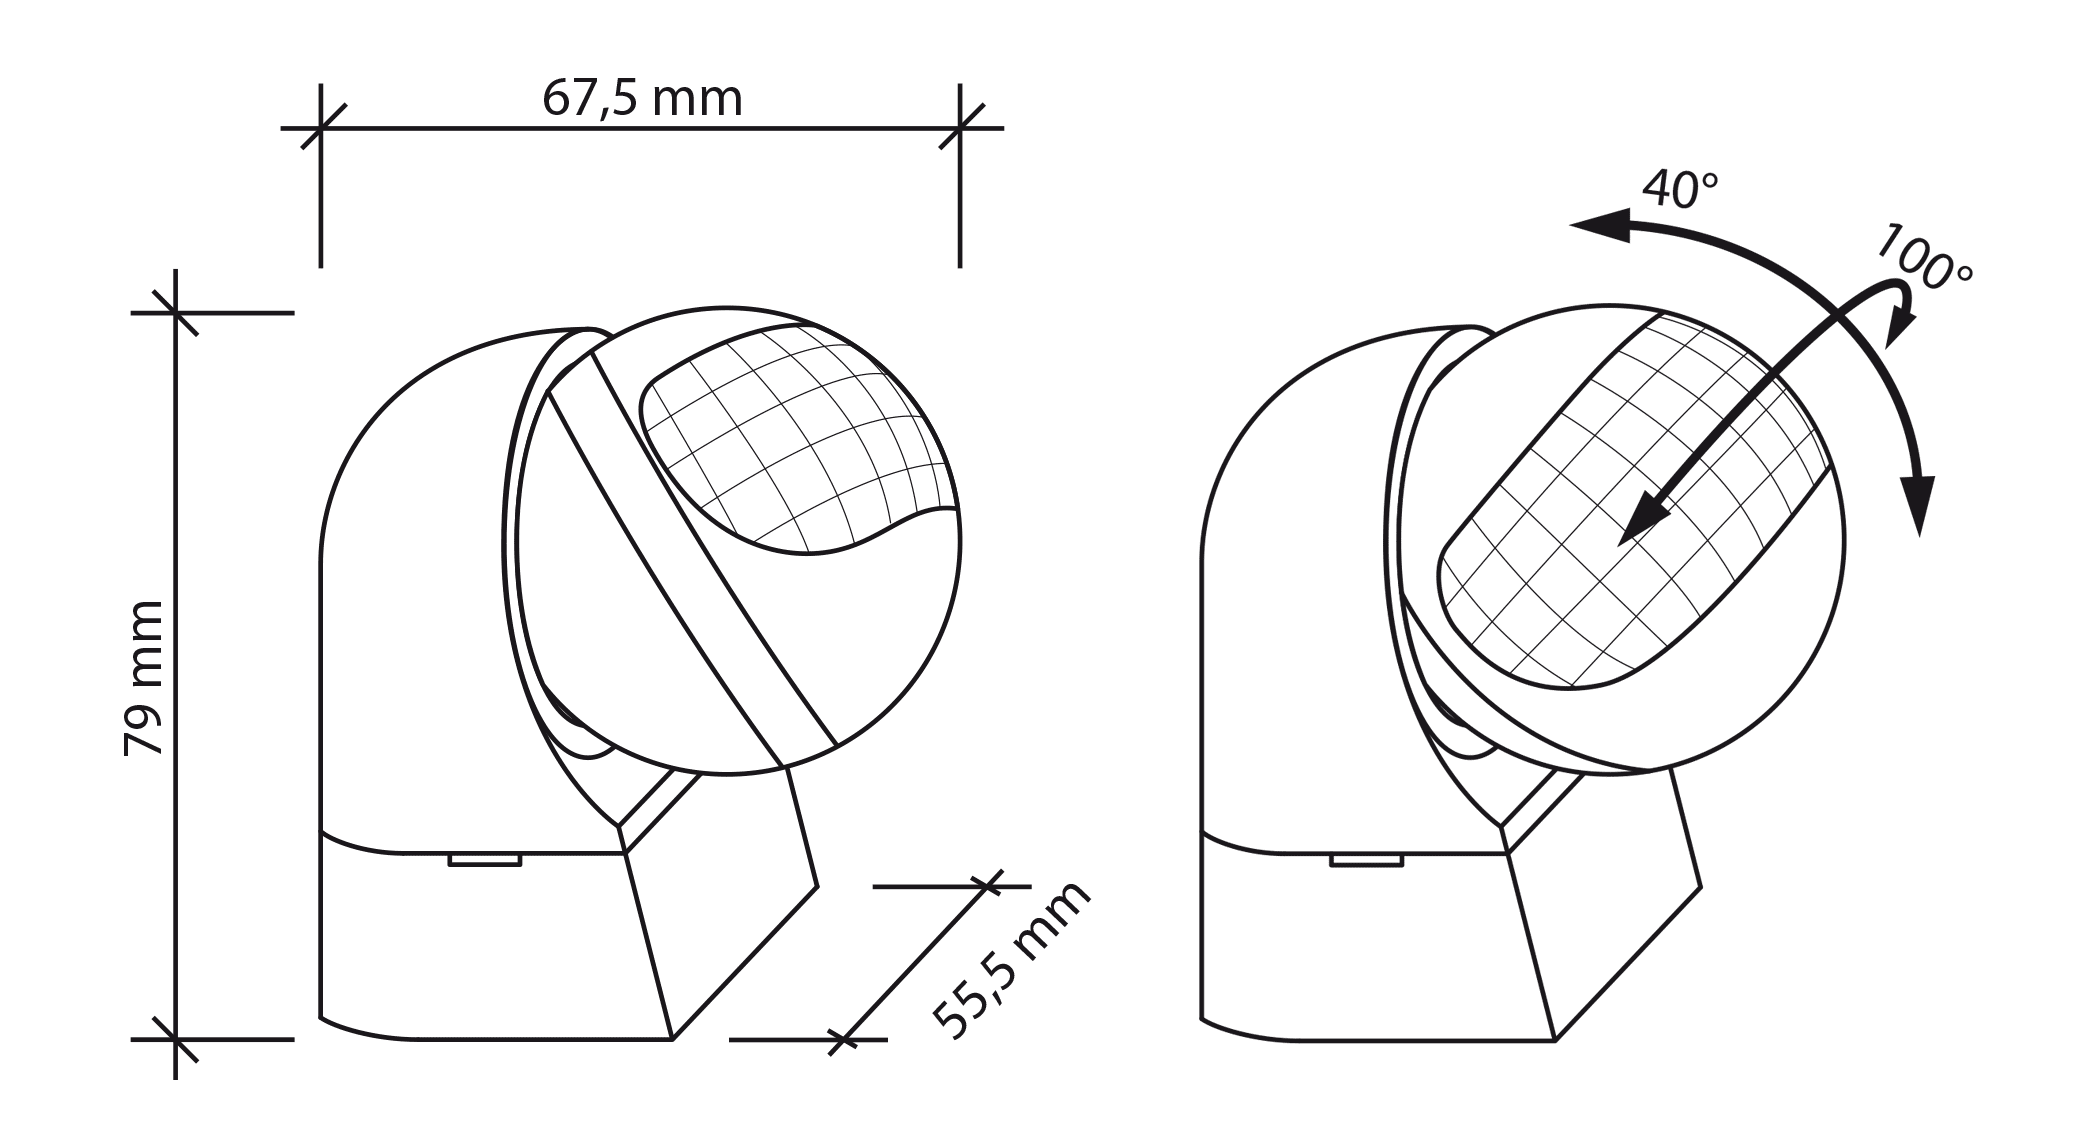 bewegungssensor bewegungsmelder aussen aufputz wanmontage infrarot sensor sebson ebay. Black Bedroom Furniture Sets. Home Design Ideas